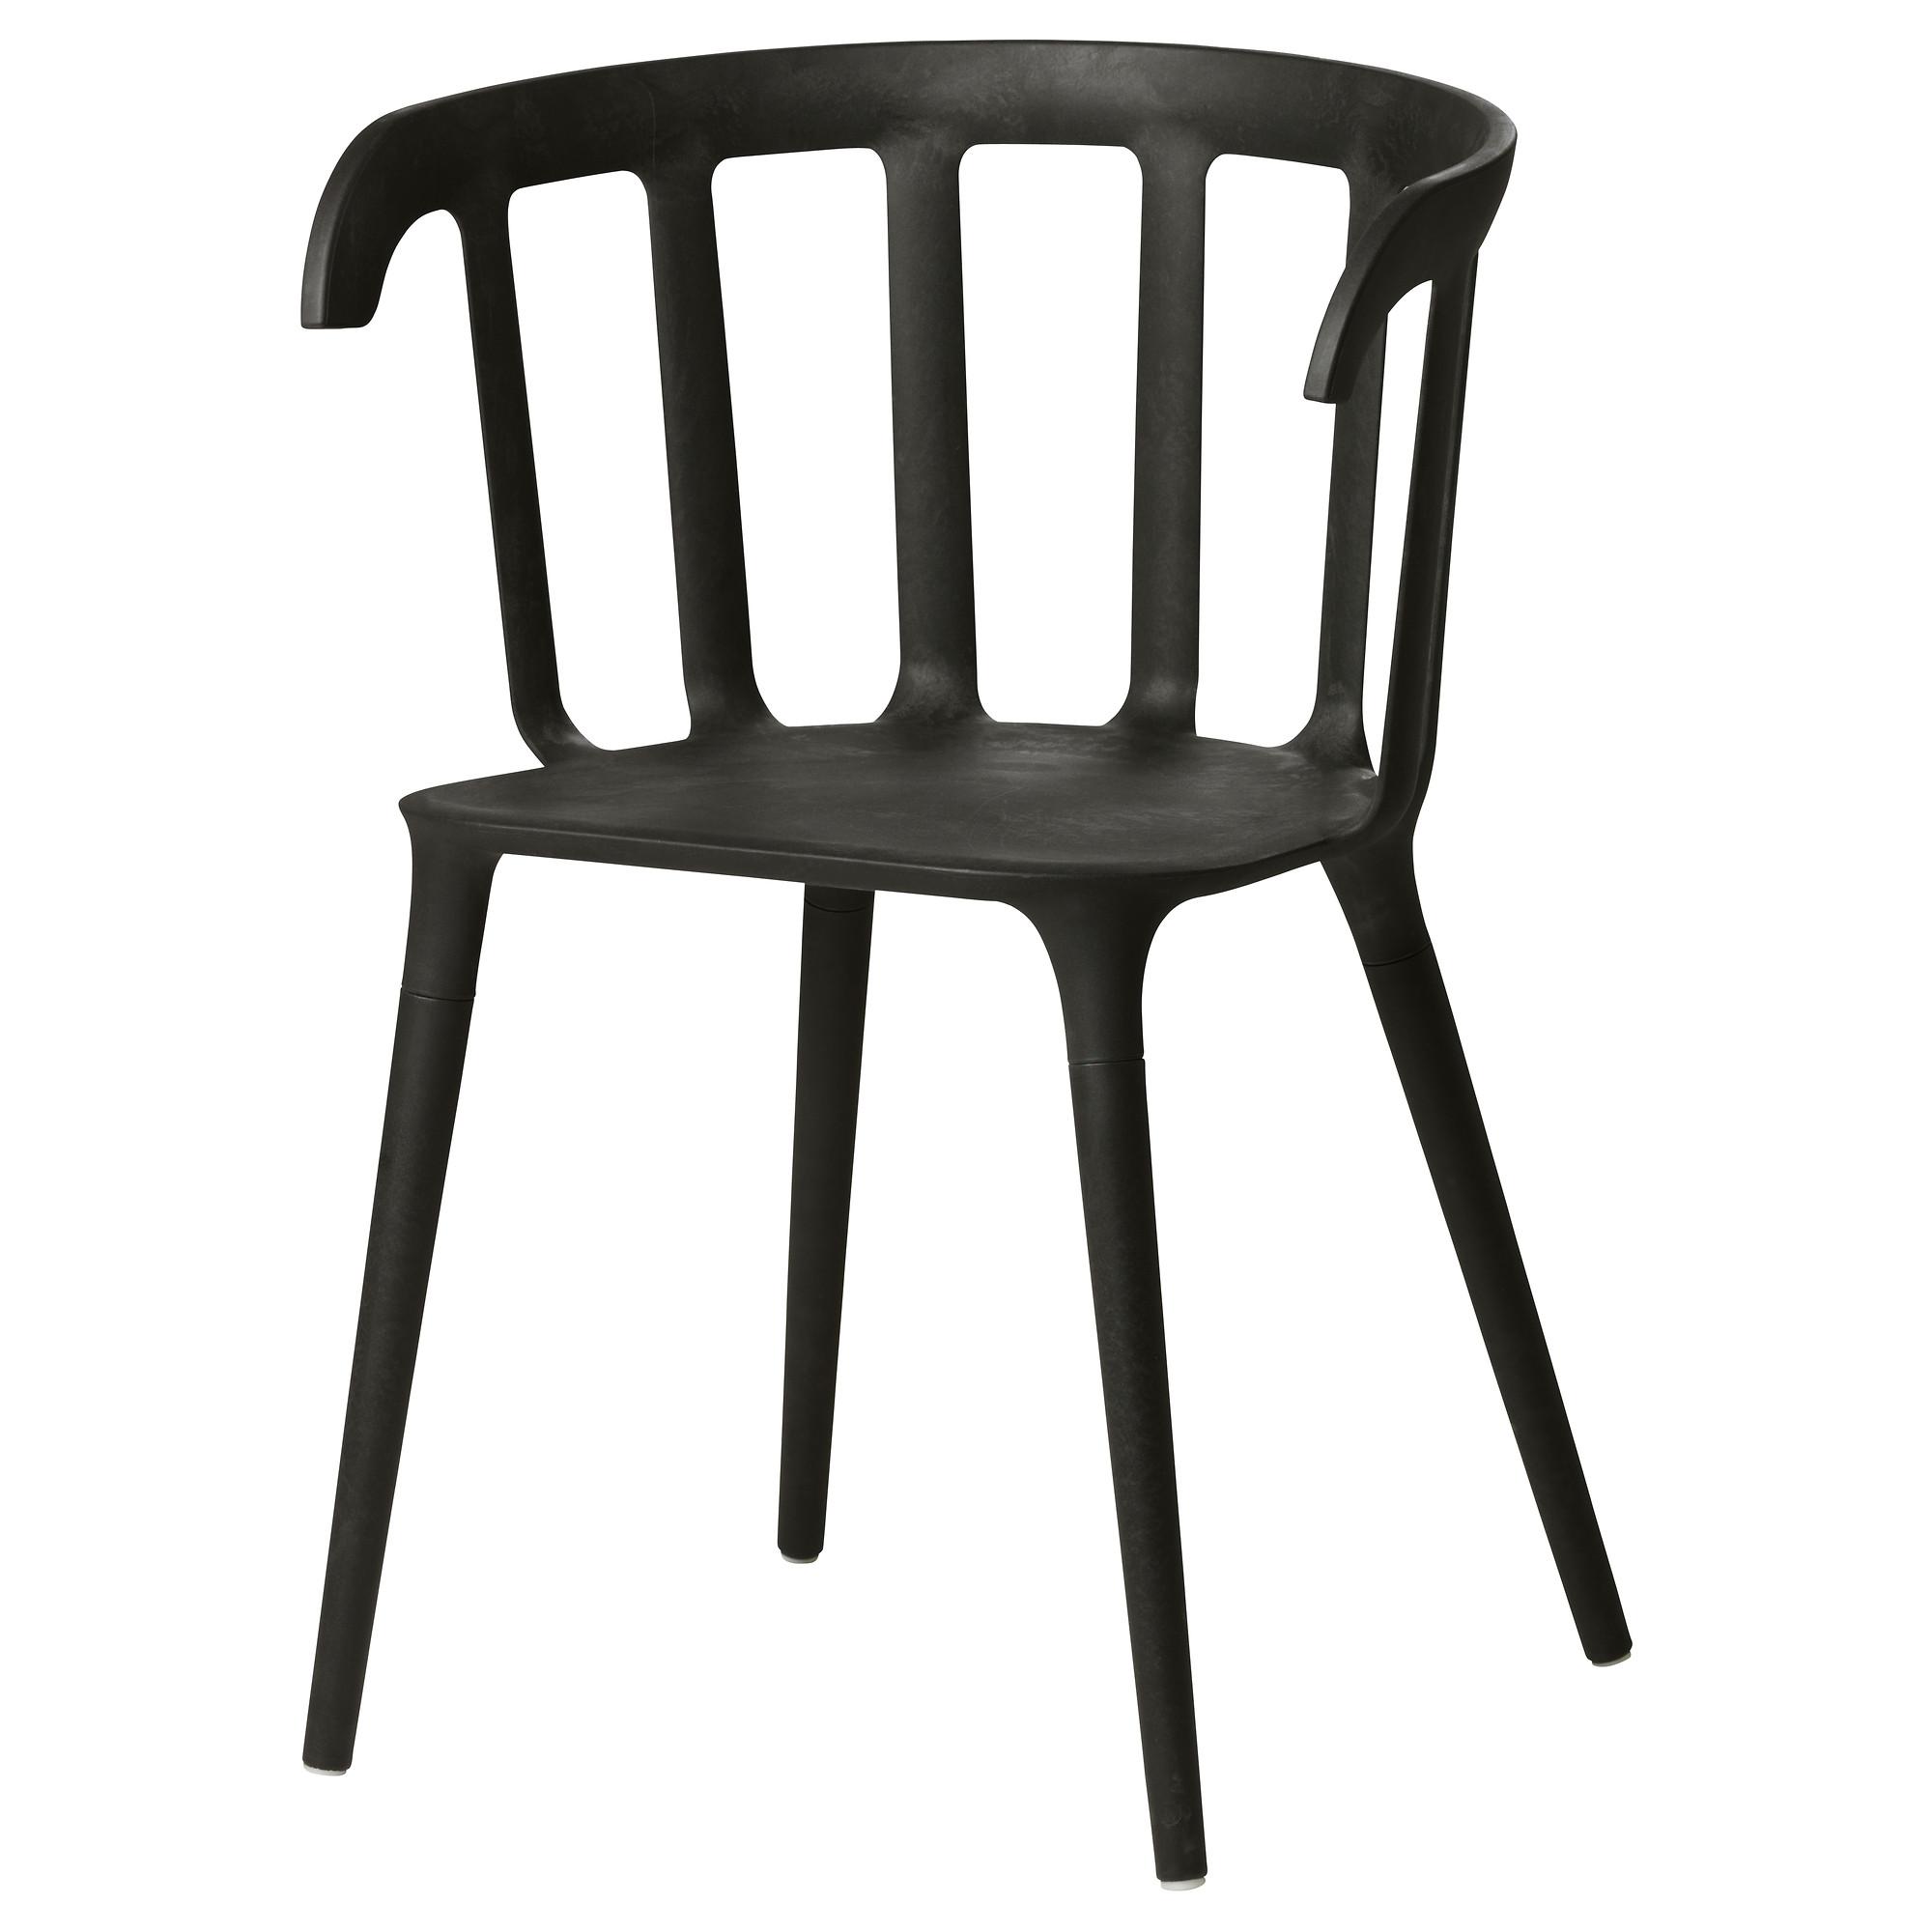 ikea PS 2012 aRMCHAIR - Black, $85.00